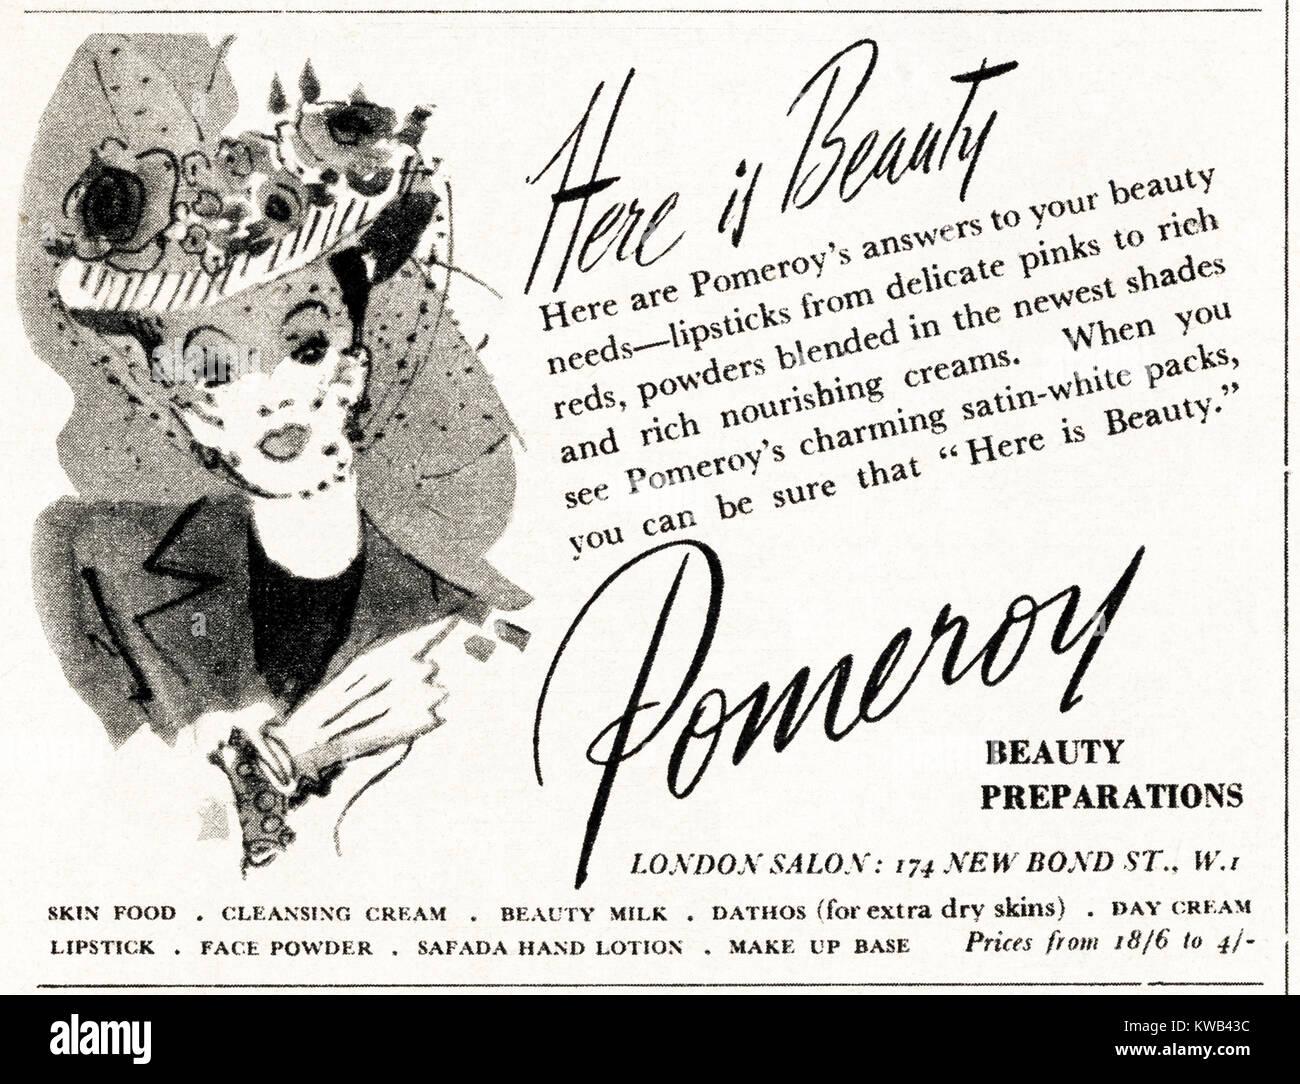 1940s old vintage original advert advertising Pomeroy cosmetics & makeup in magazine circa 1947 when supplies - Stock Image